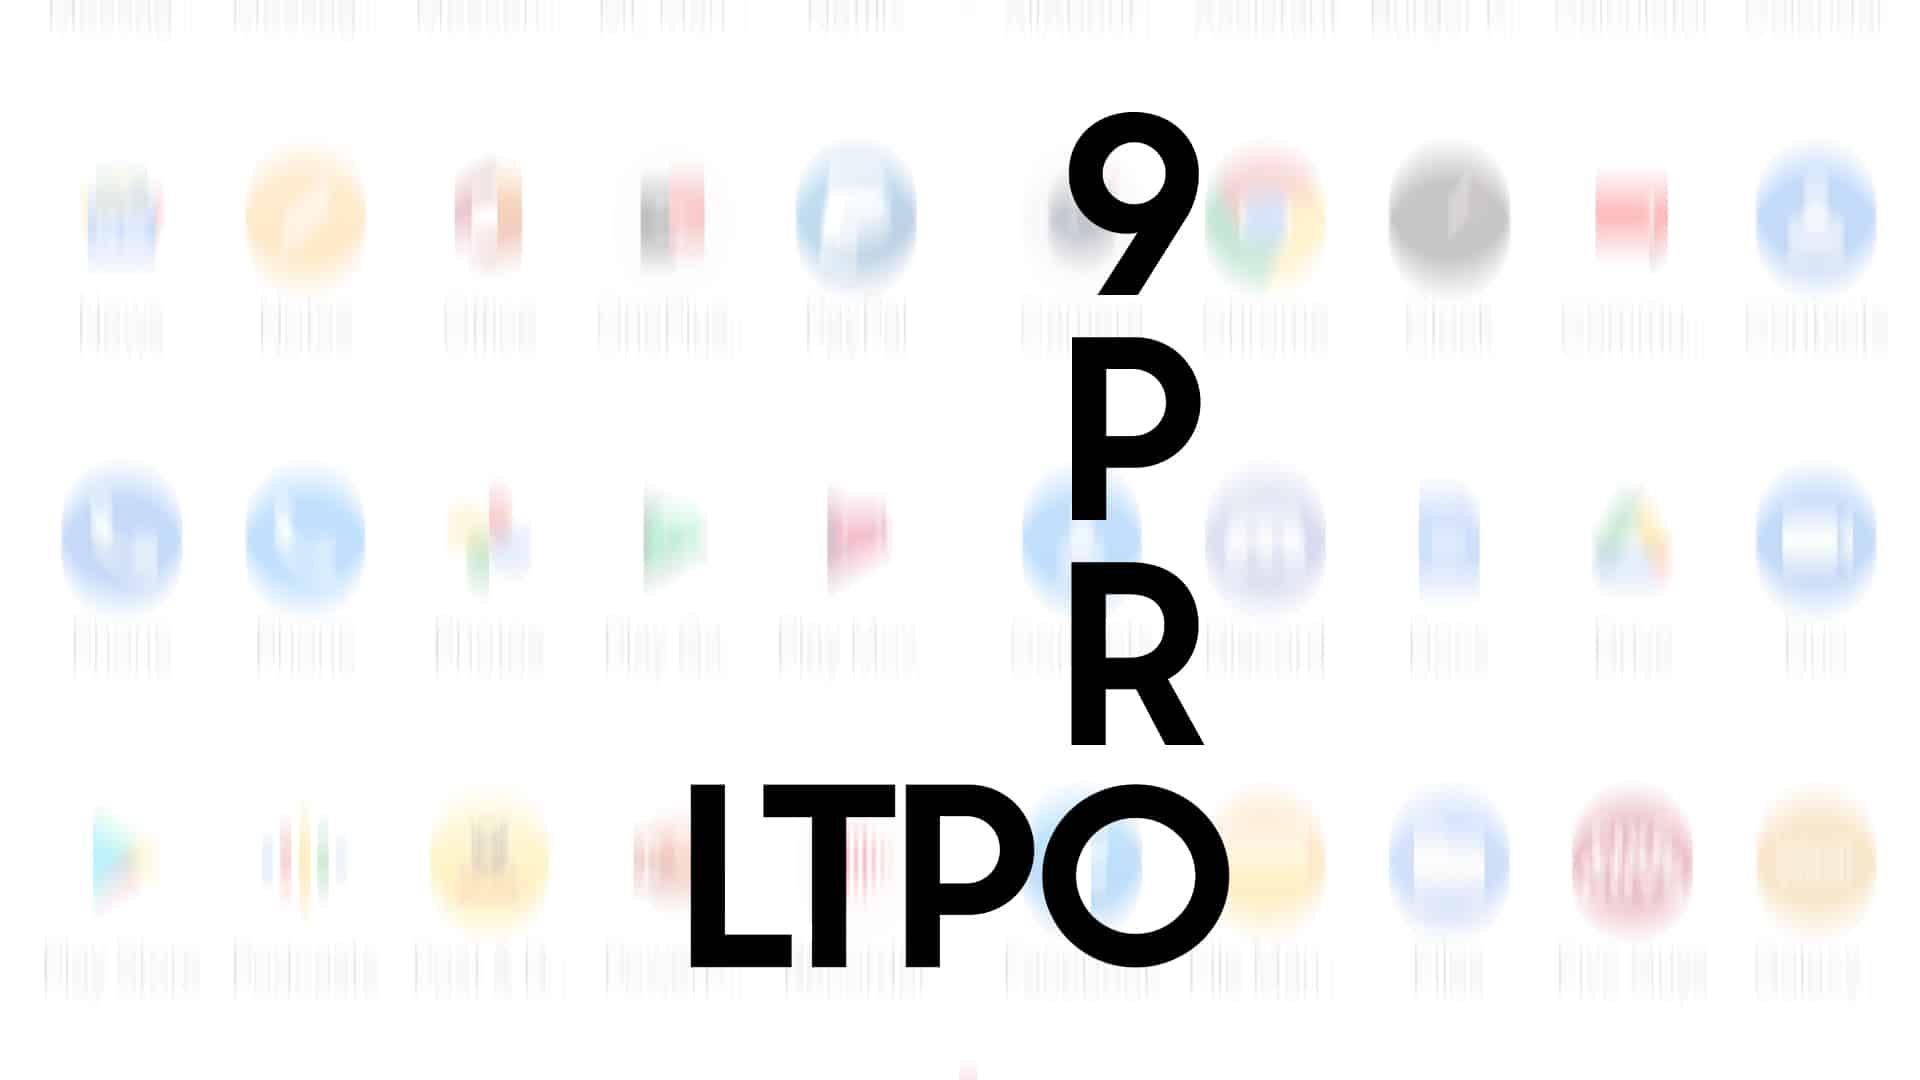 OnePlus 9 Pro LTPO display